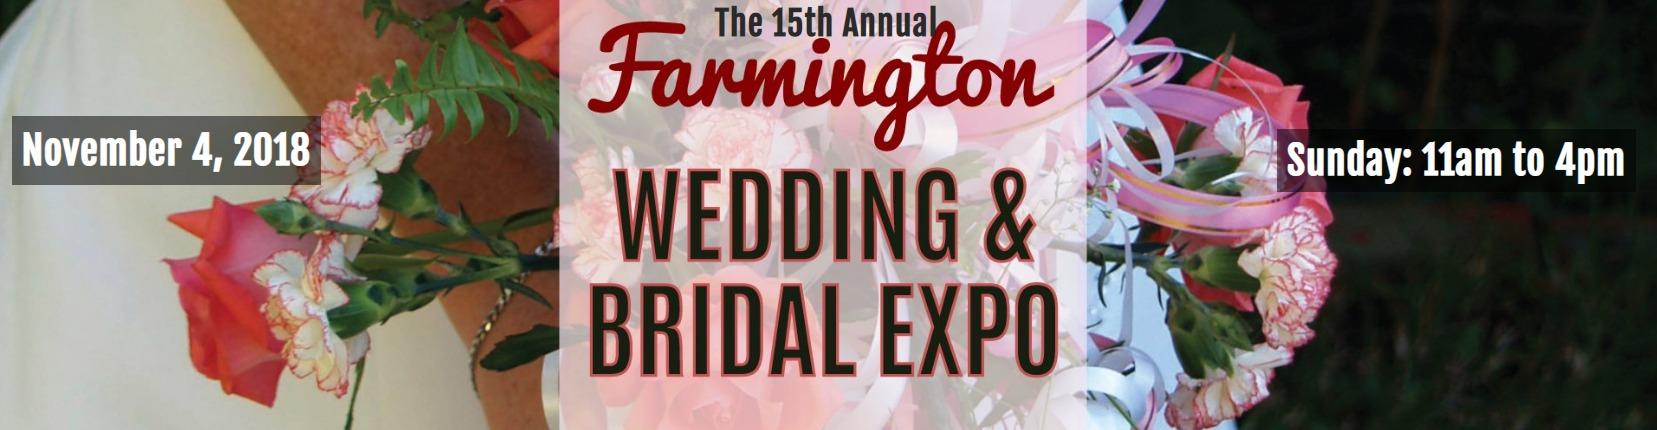 Wedding & Bridal Expo CT - Farmington Marriot – November 4, 2018 from 11am - 4pm